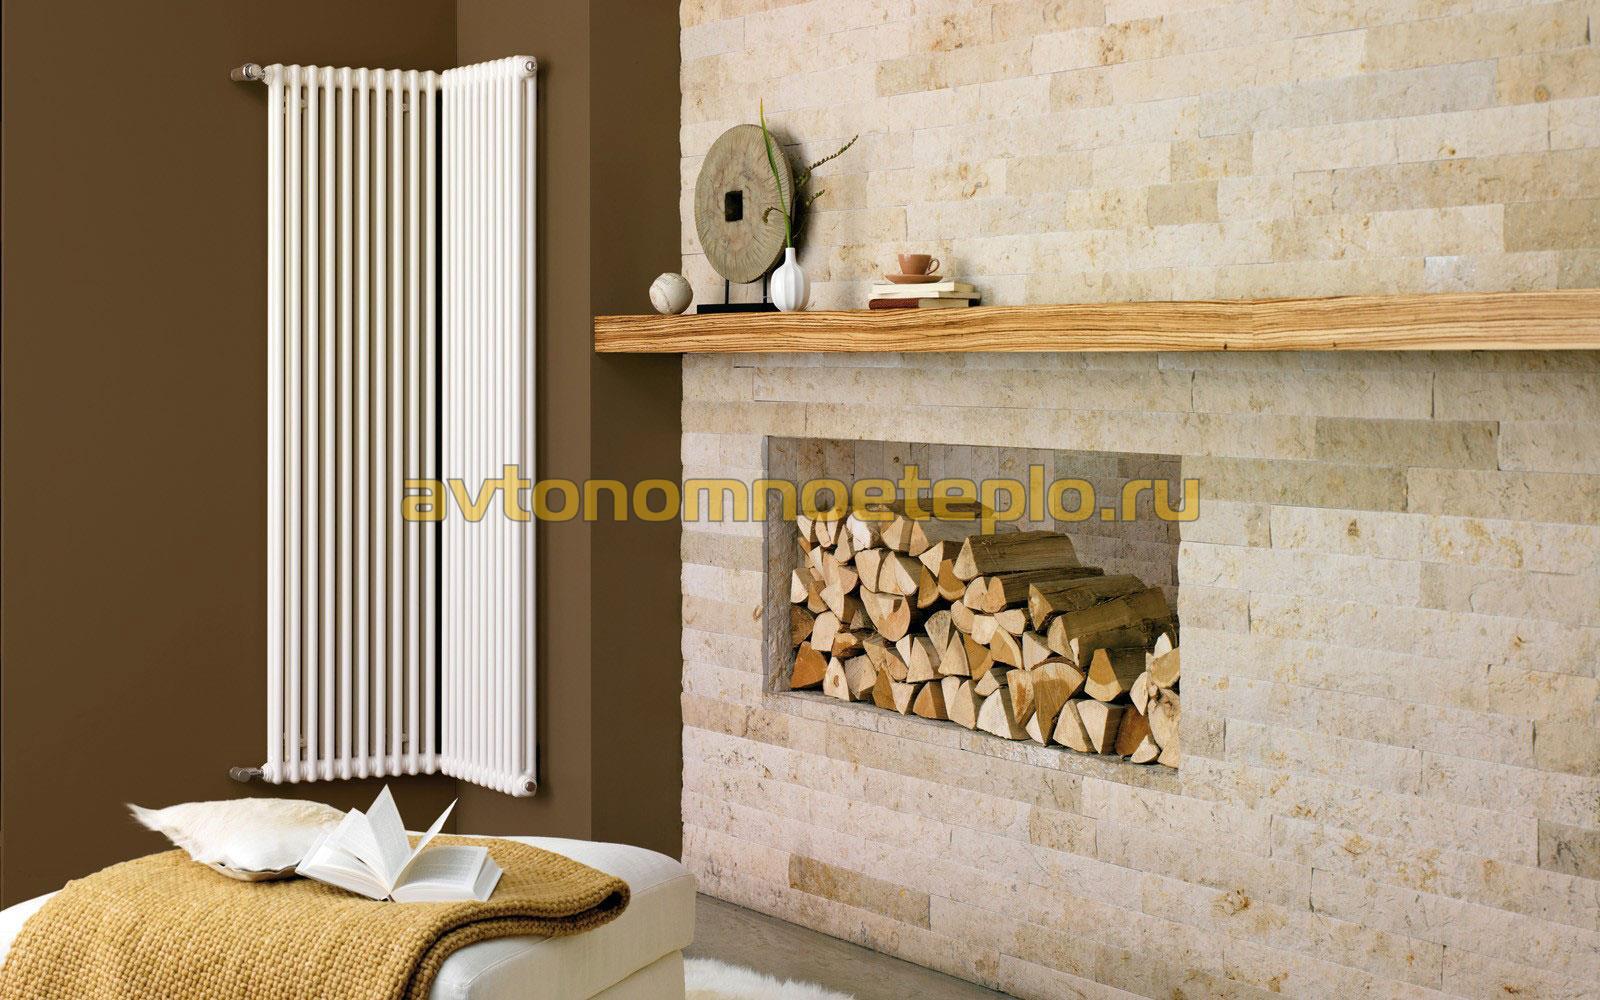 pourcentage chauffage electrique en france nanterre. Black Bedroom Furniture Sets. Home Design Ideas